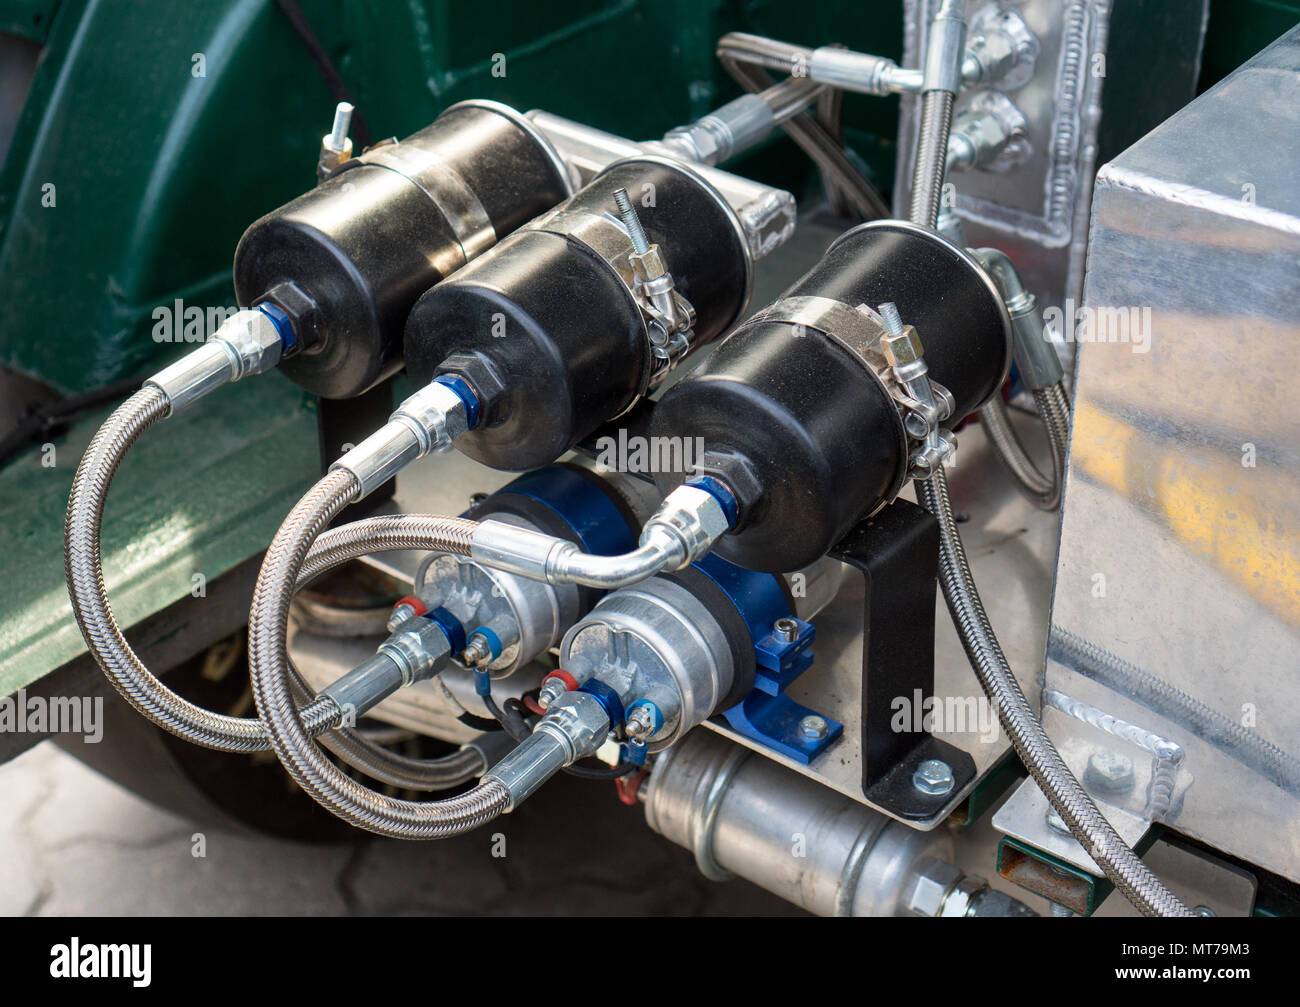 Handmade nitrous oxide engine in car trunk. - Stock Image